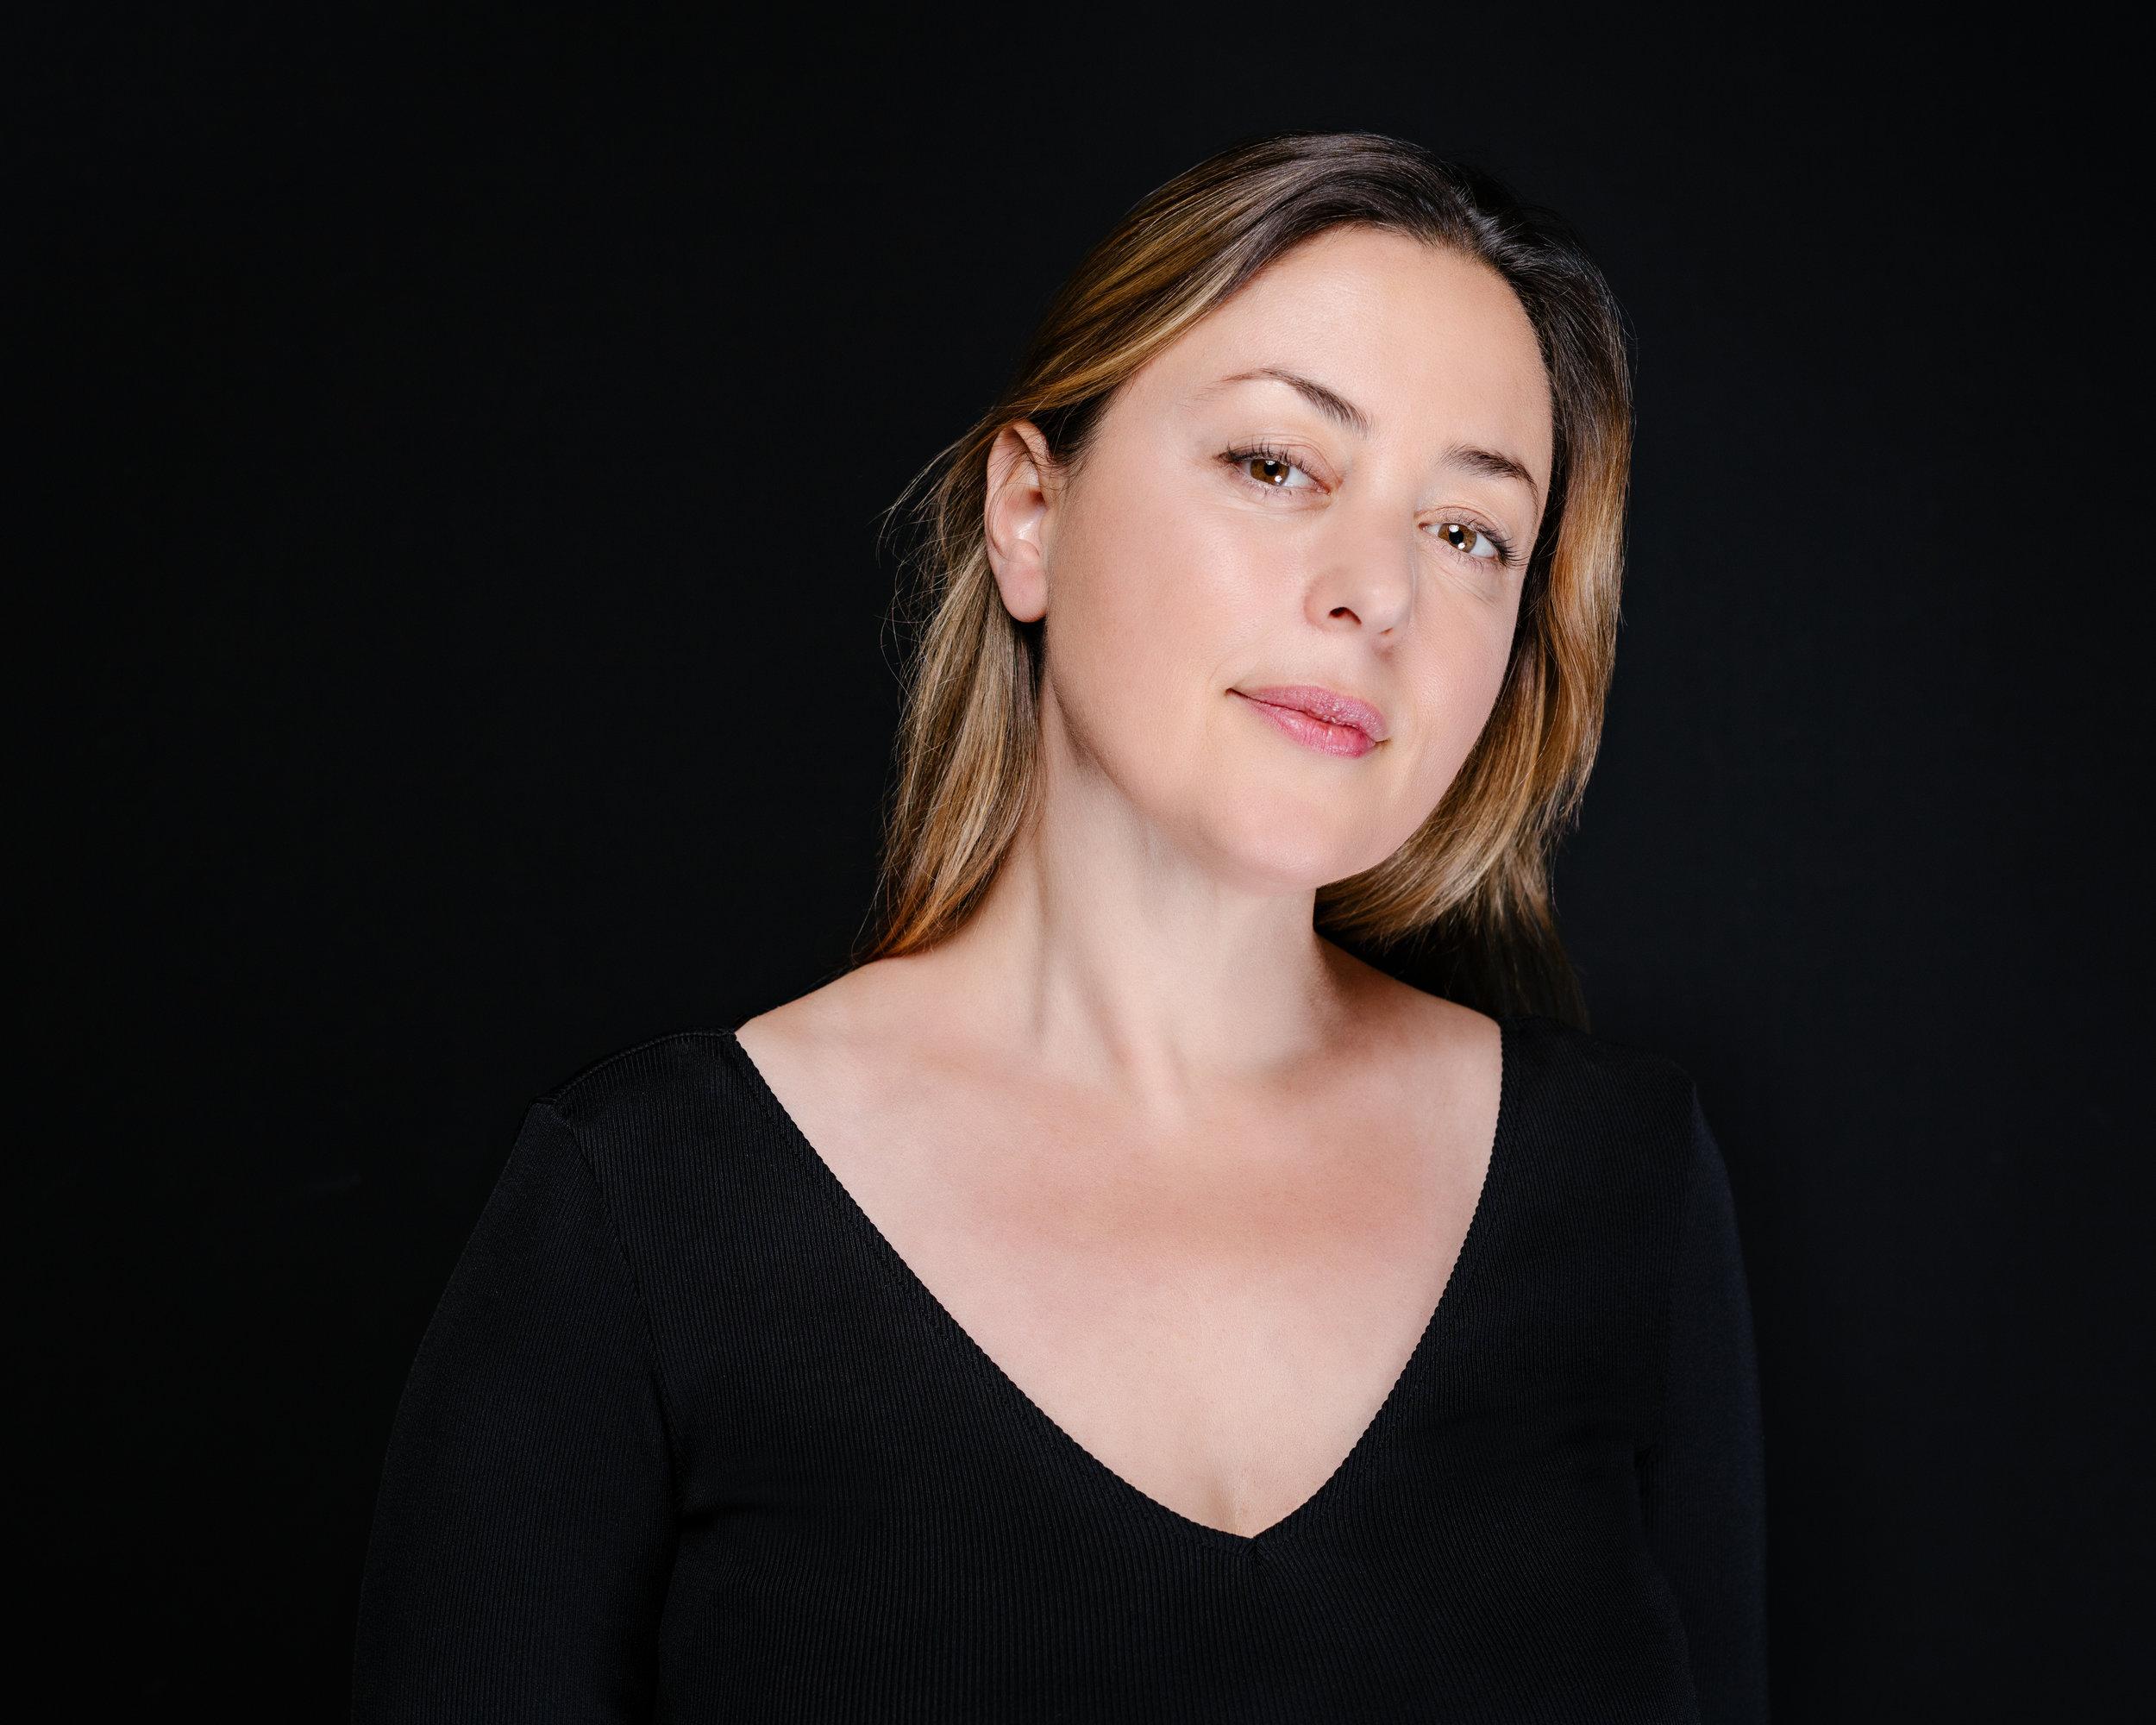 Paola Prestini - High Res Headshot.jpg